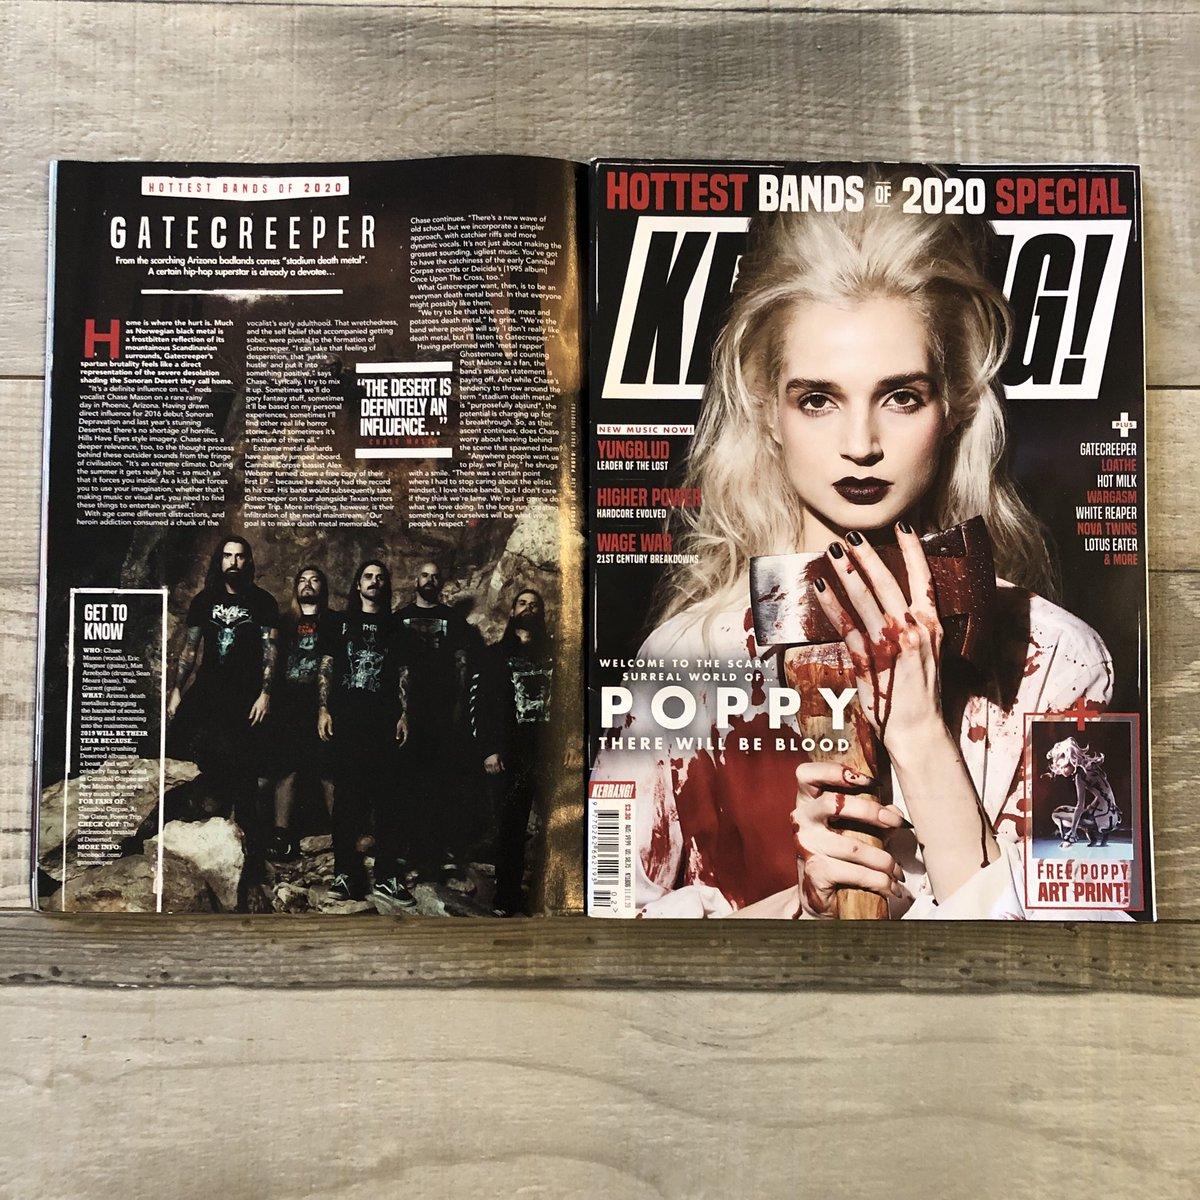 Thank you @KerrangMagazine